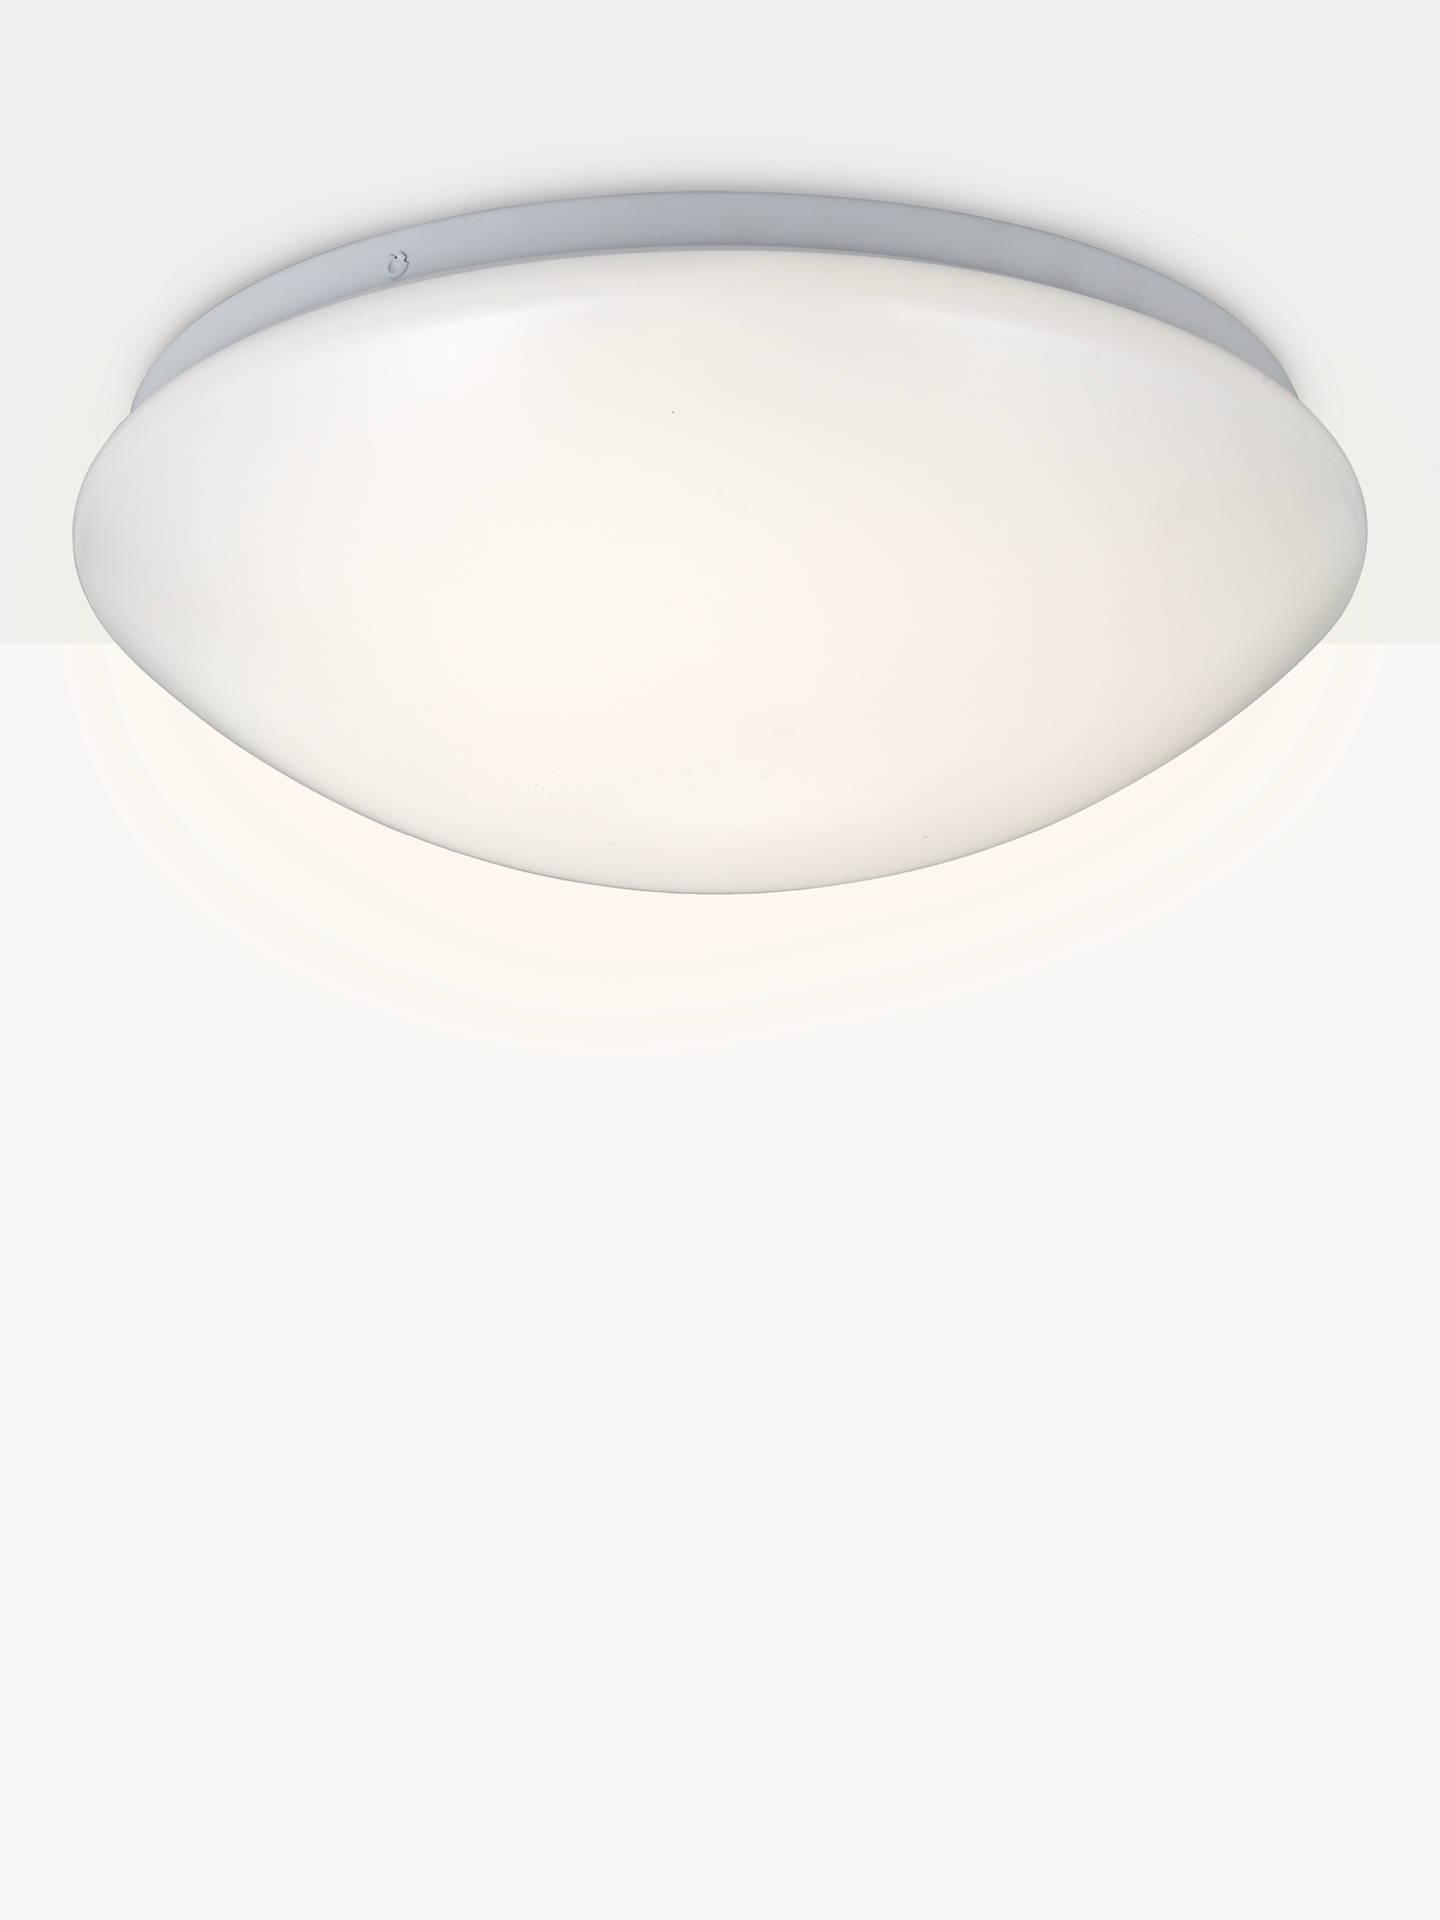 Saint Led Flush Bathroom Light Opal